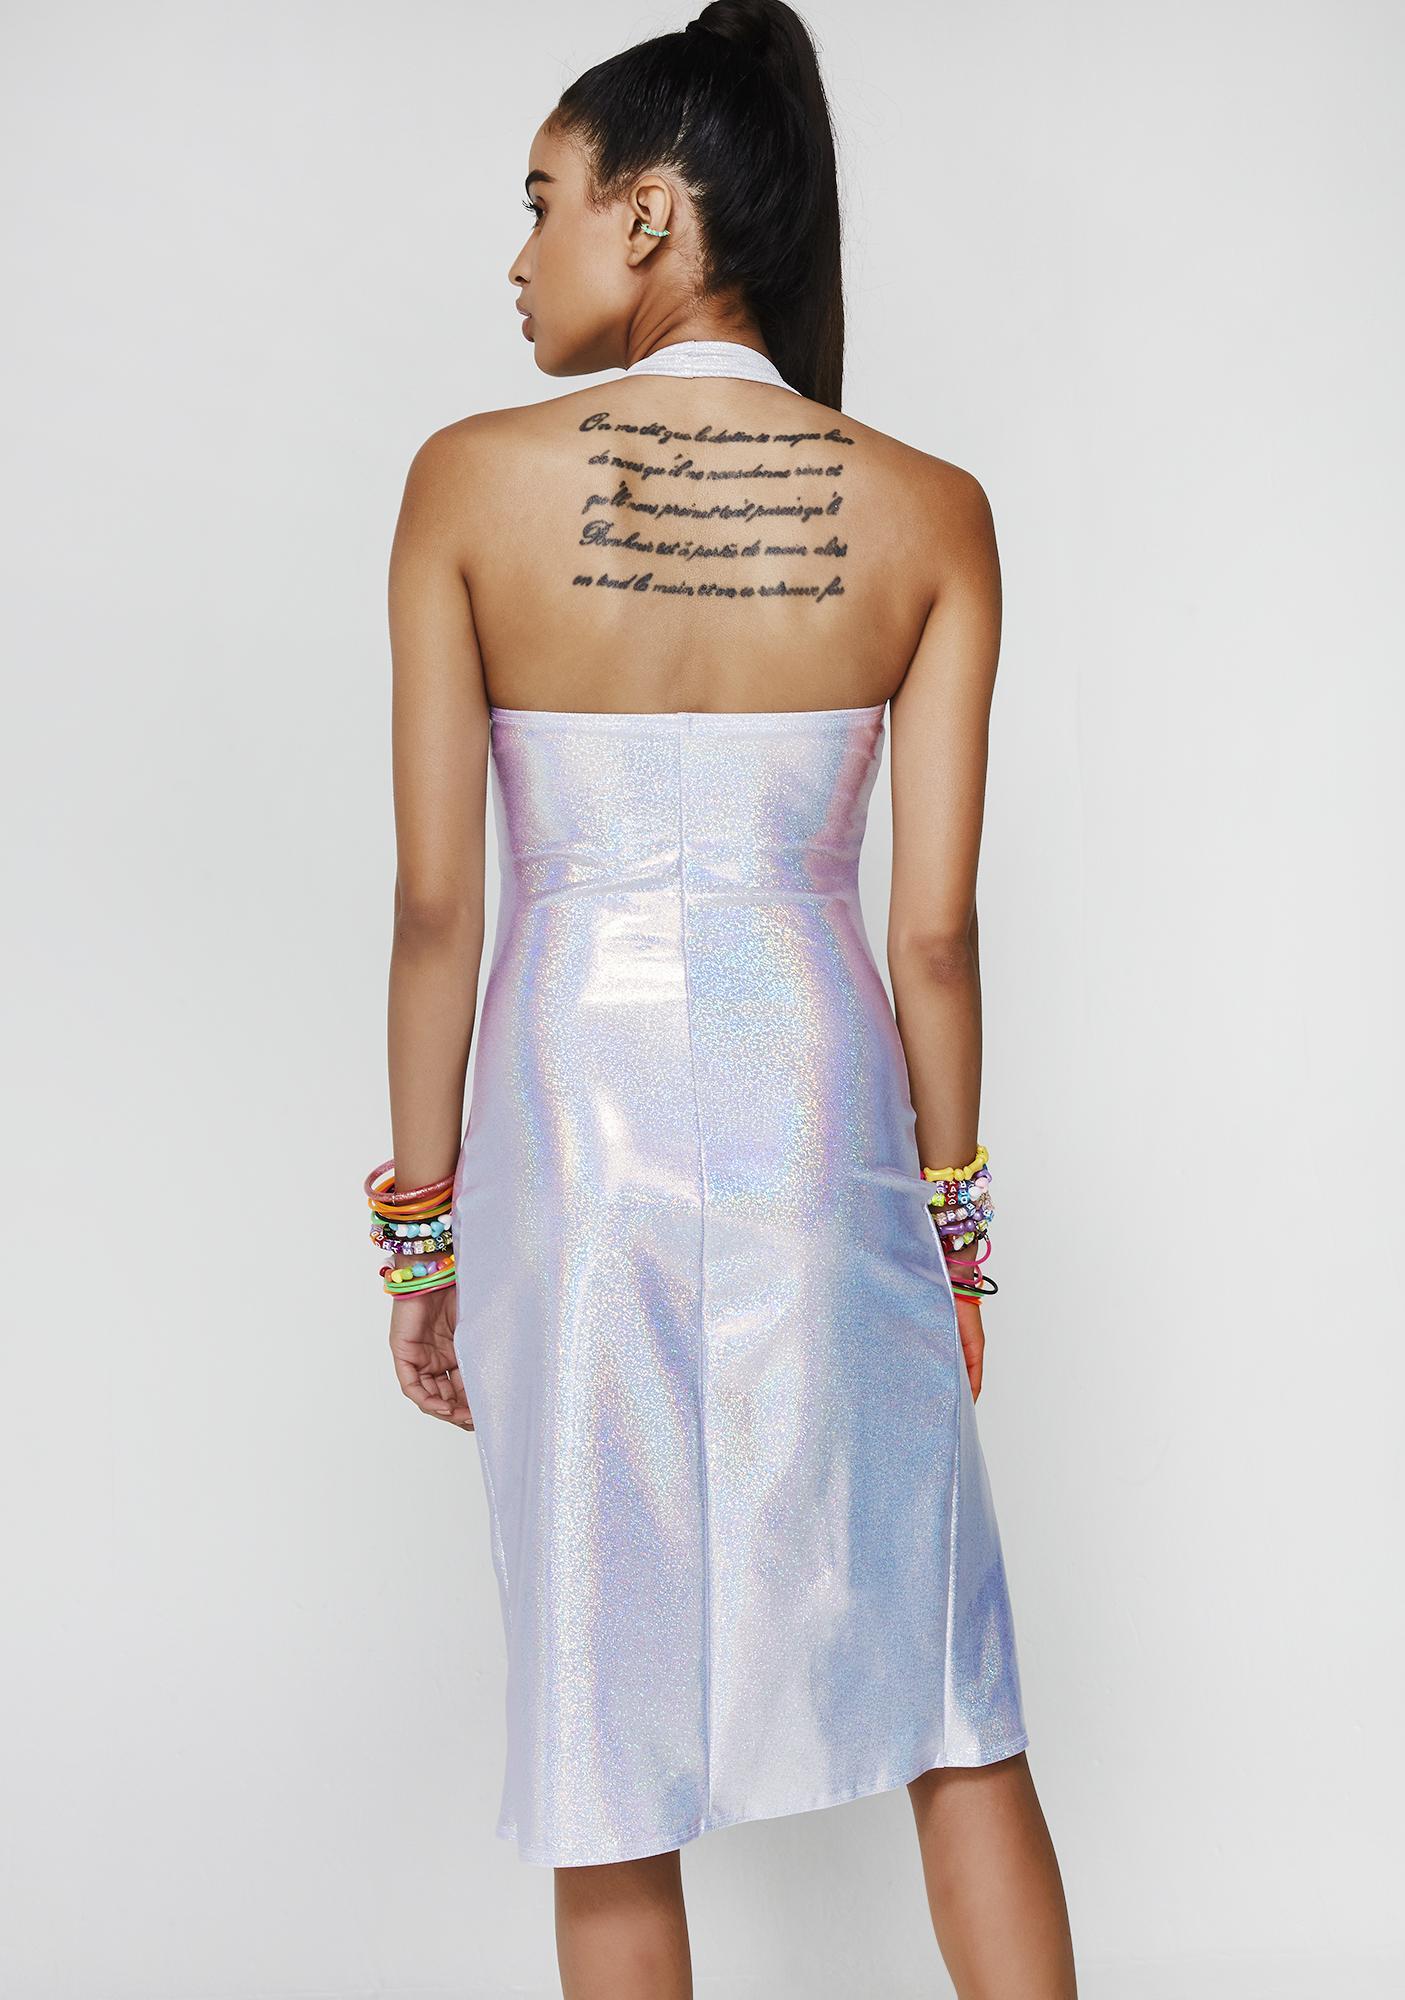 Hologram Sleek Freak Slit Dress